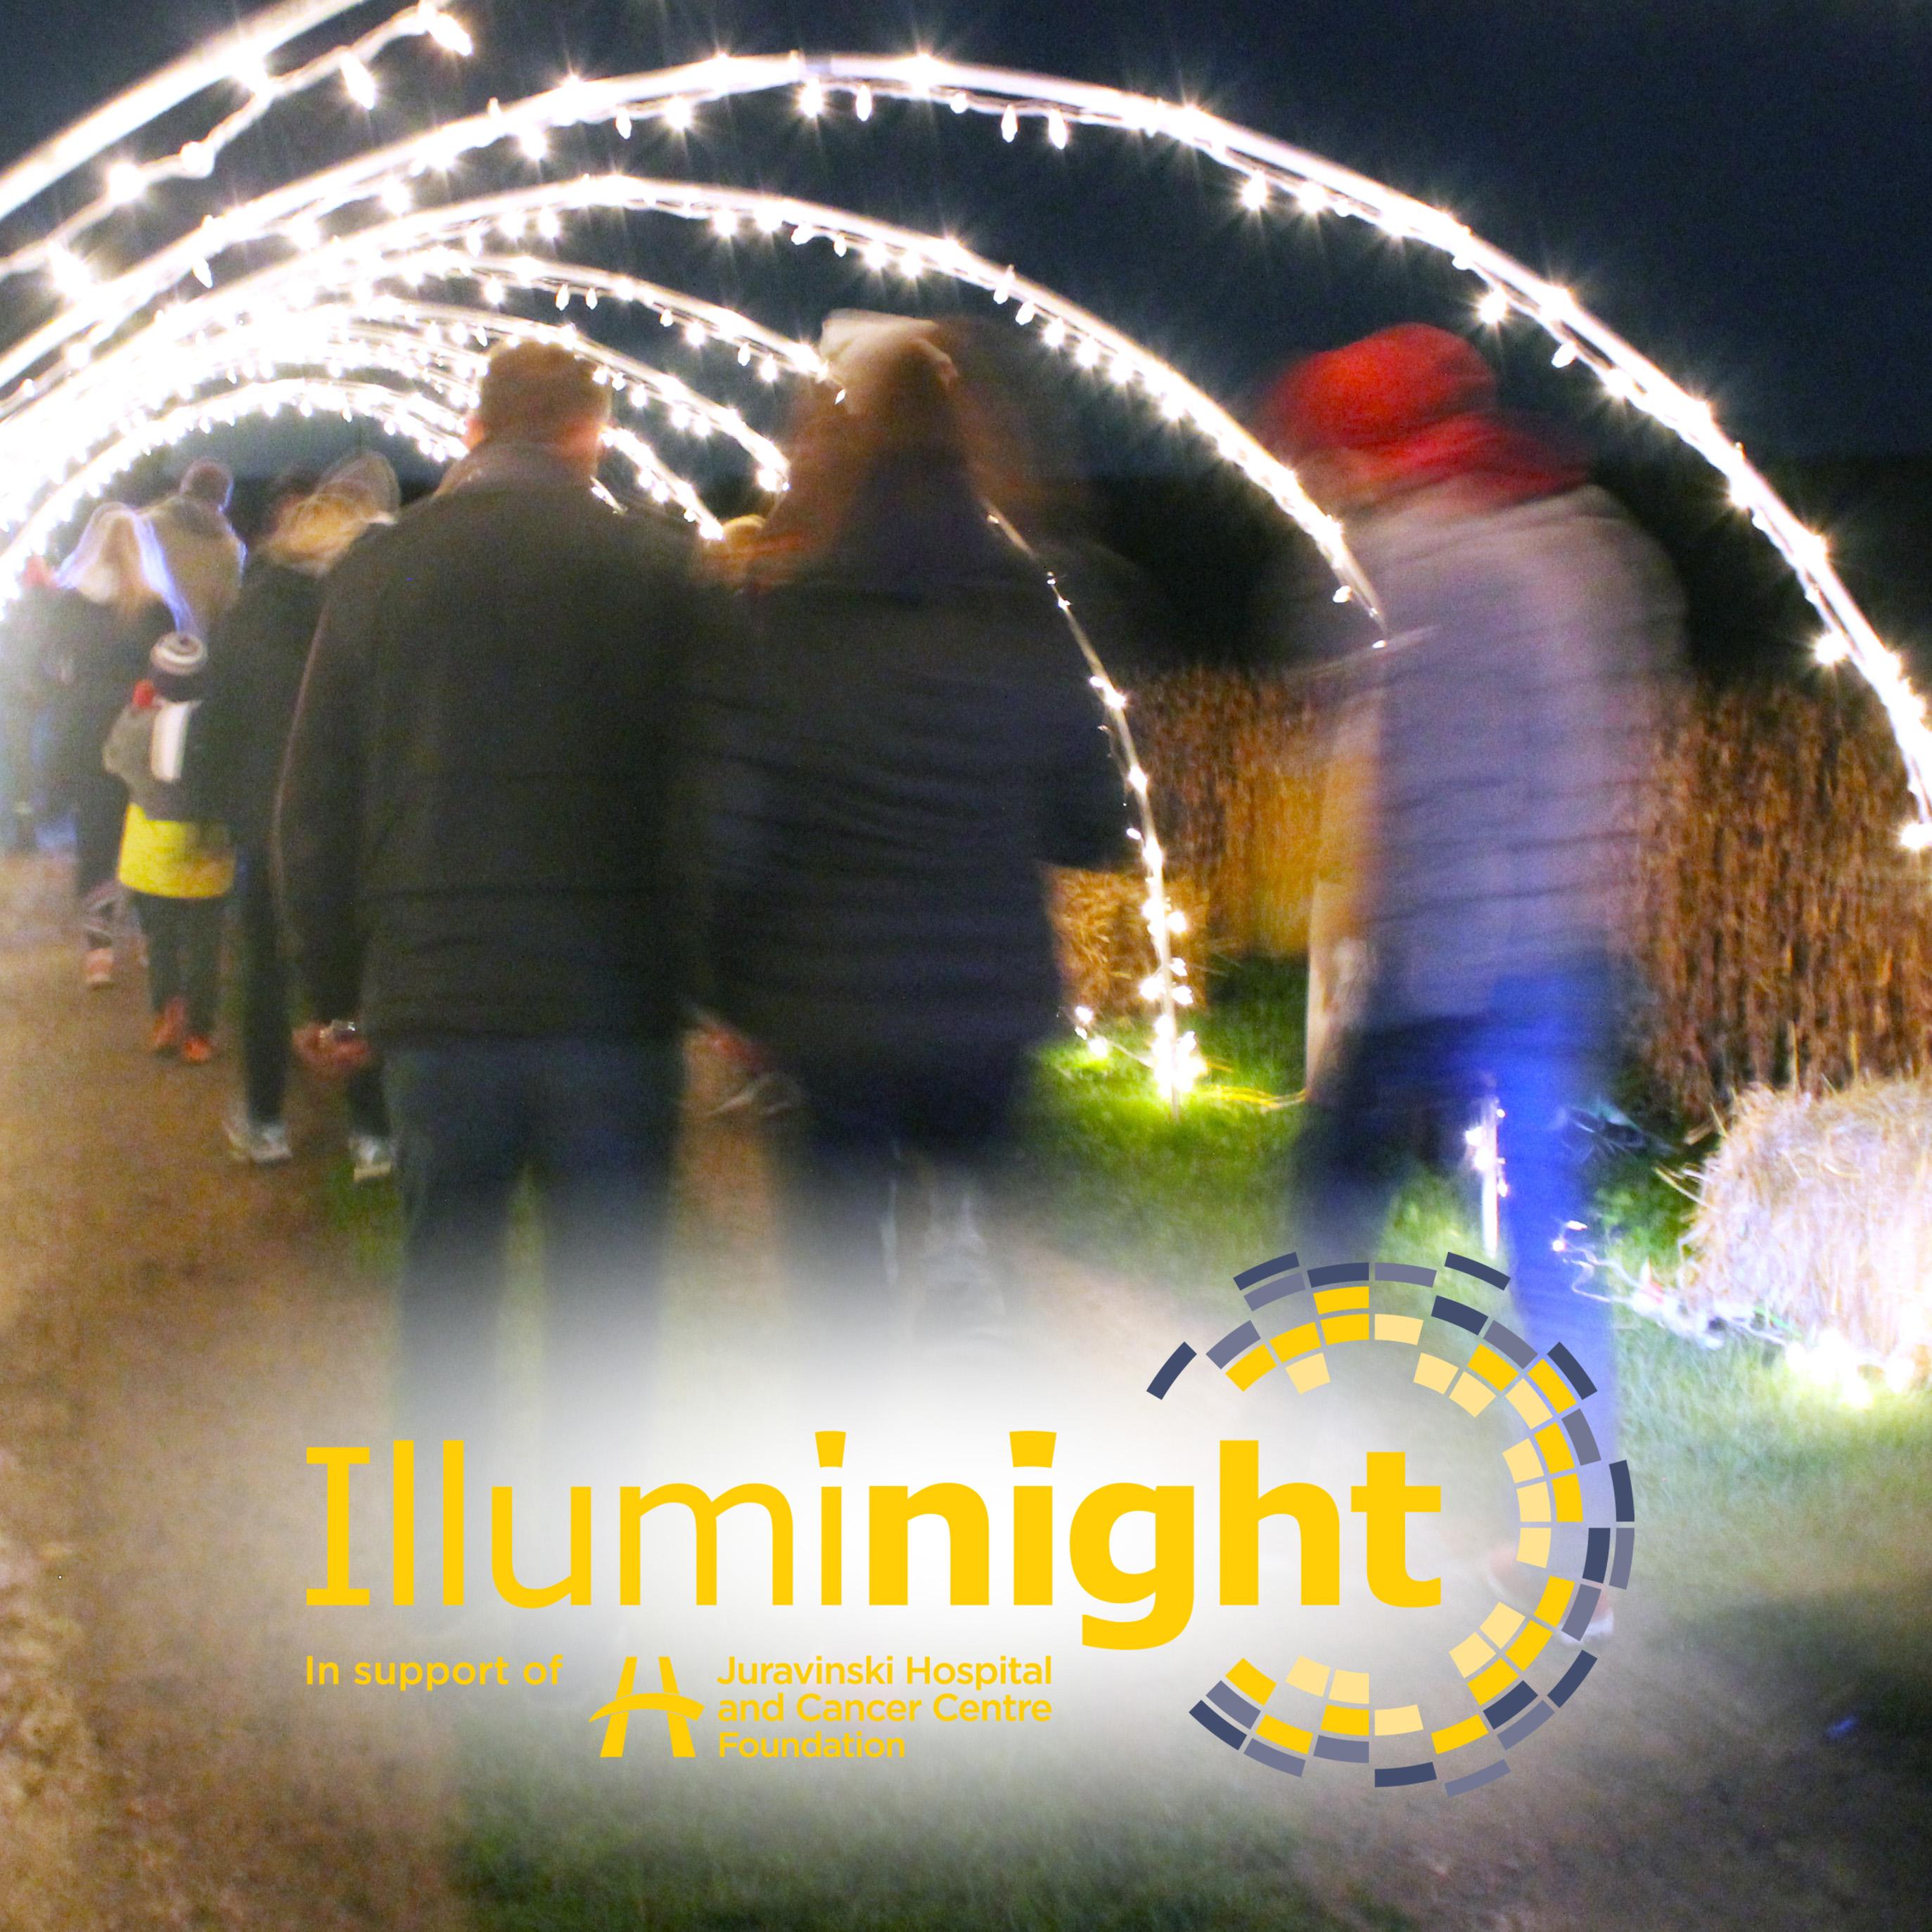 Card image for Illuminight event